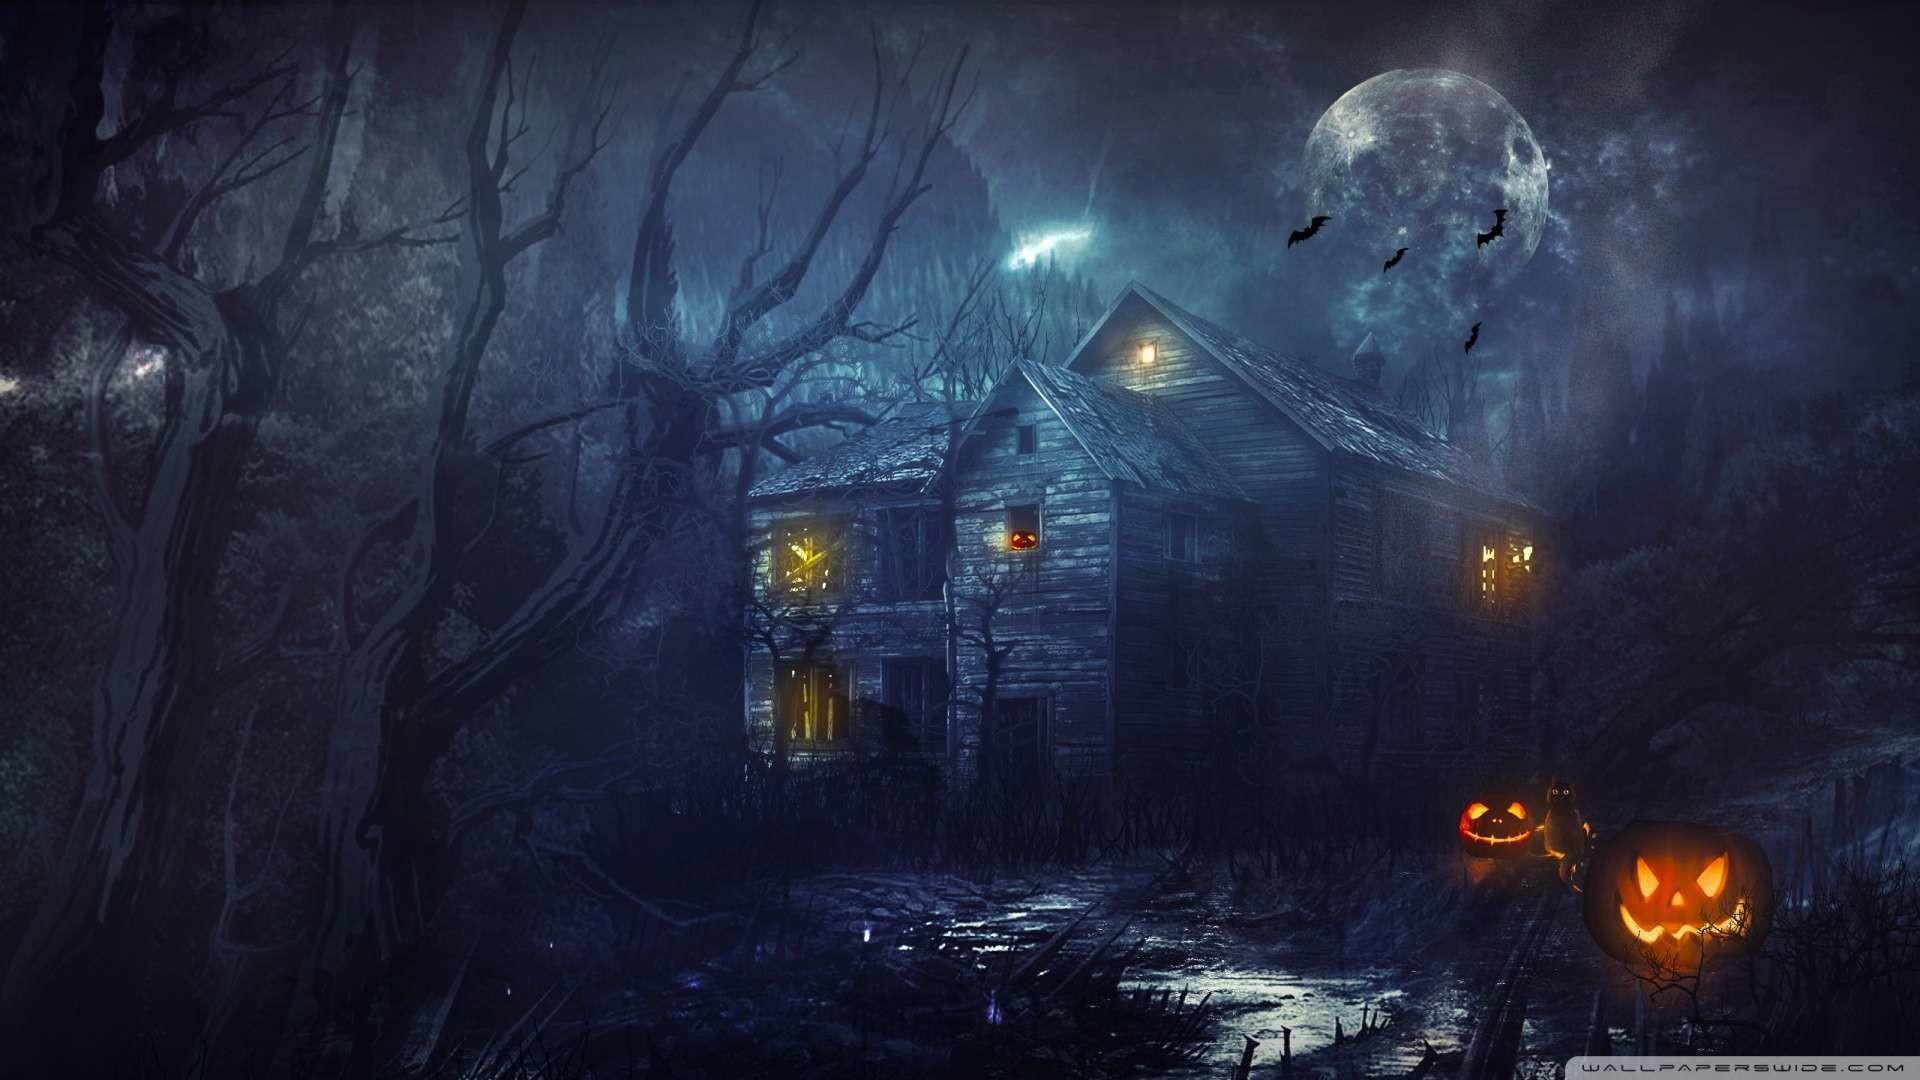 Scary Halloween Wallpaper HD 1